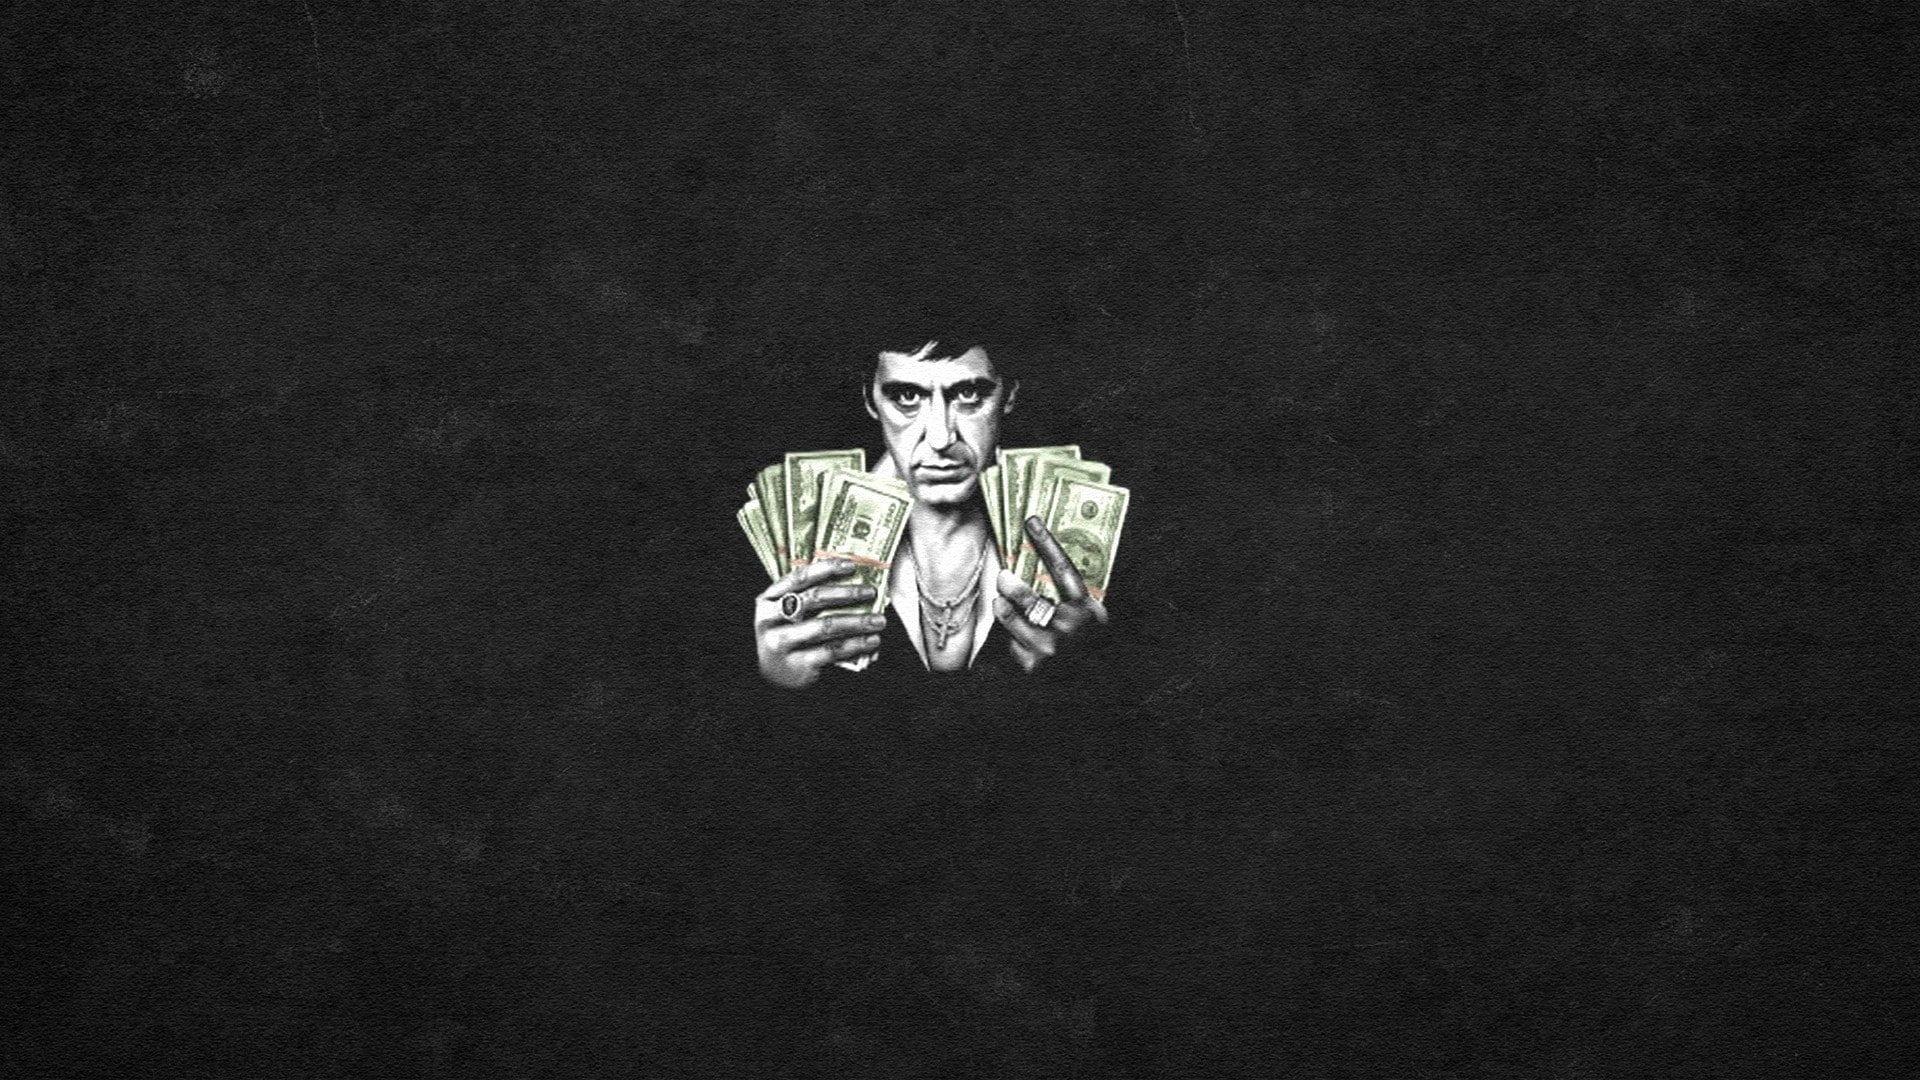 Scarface Tony Montana Al Pacino Black Background 1080p Wallpaper Hdwallpaper Desktop Unicorn Wallpaper Cute Al Pacino Scarface